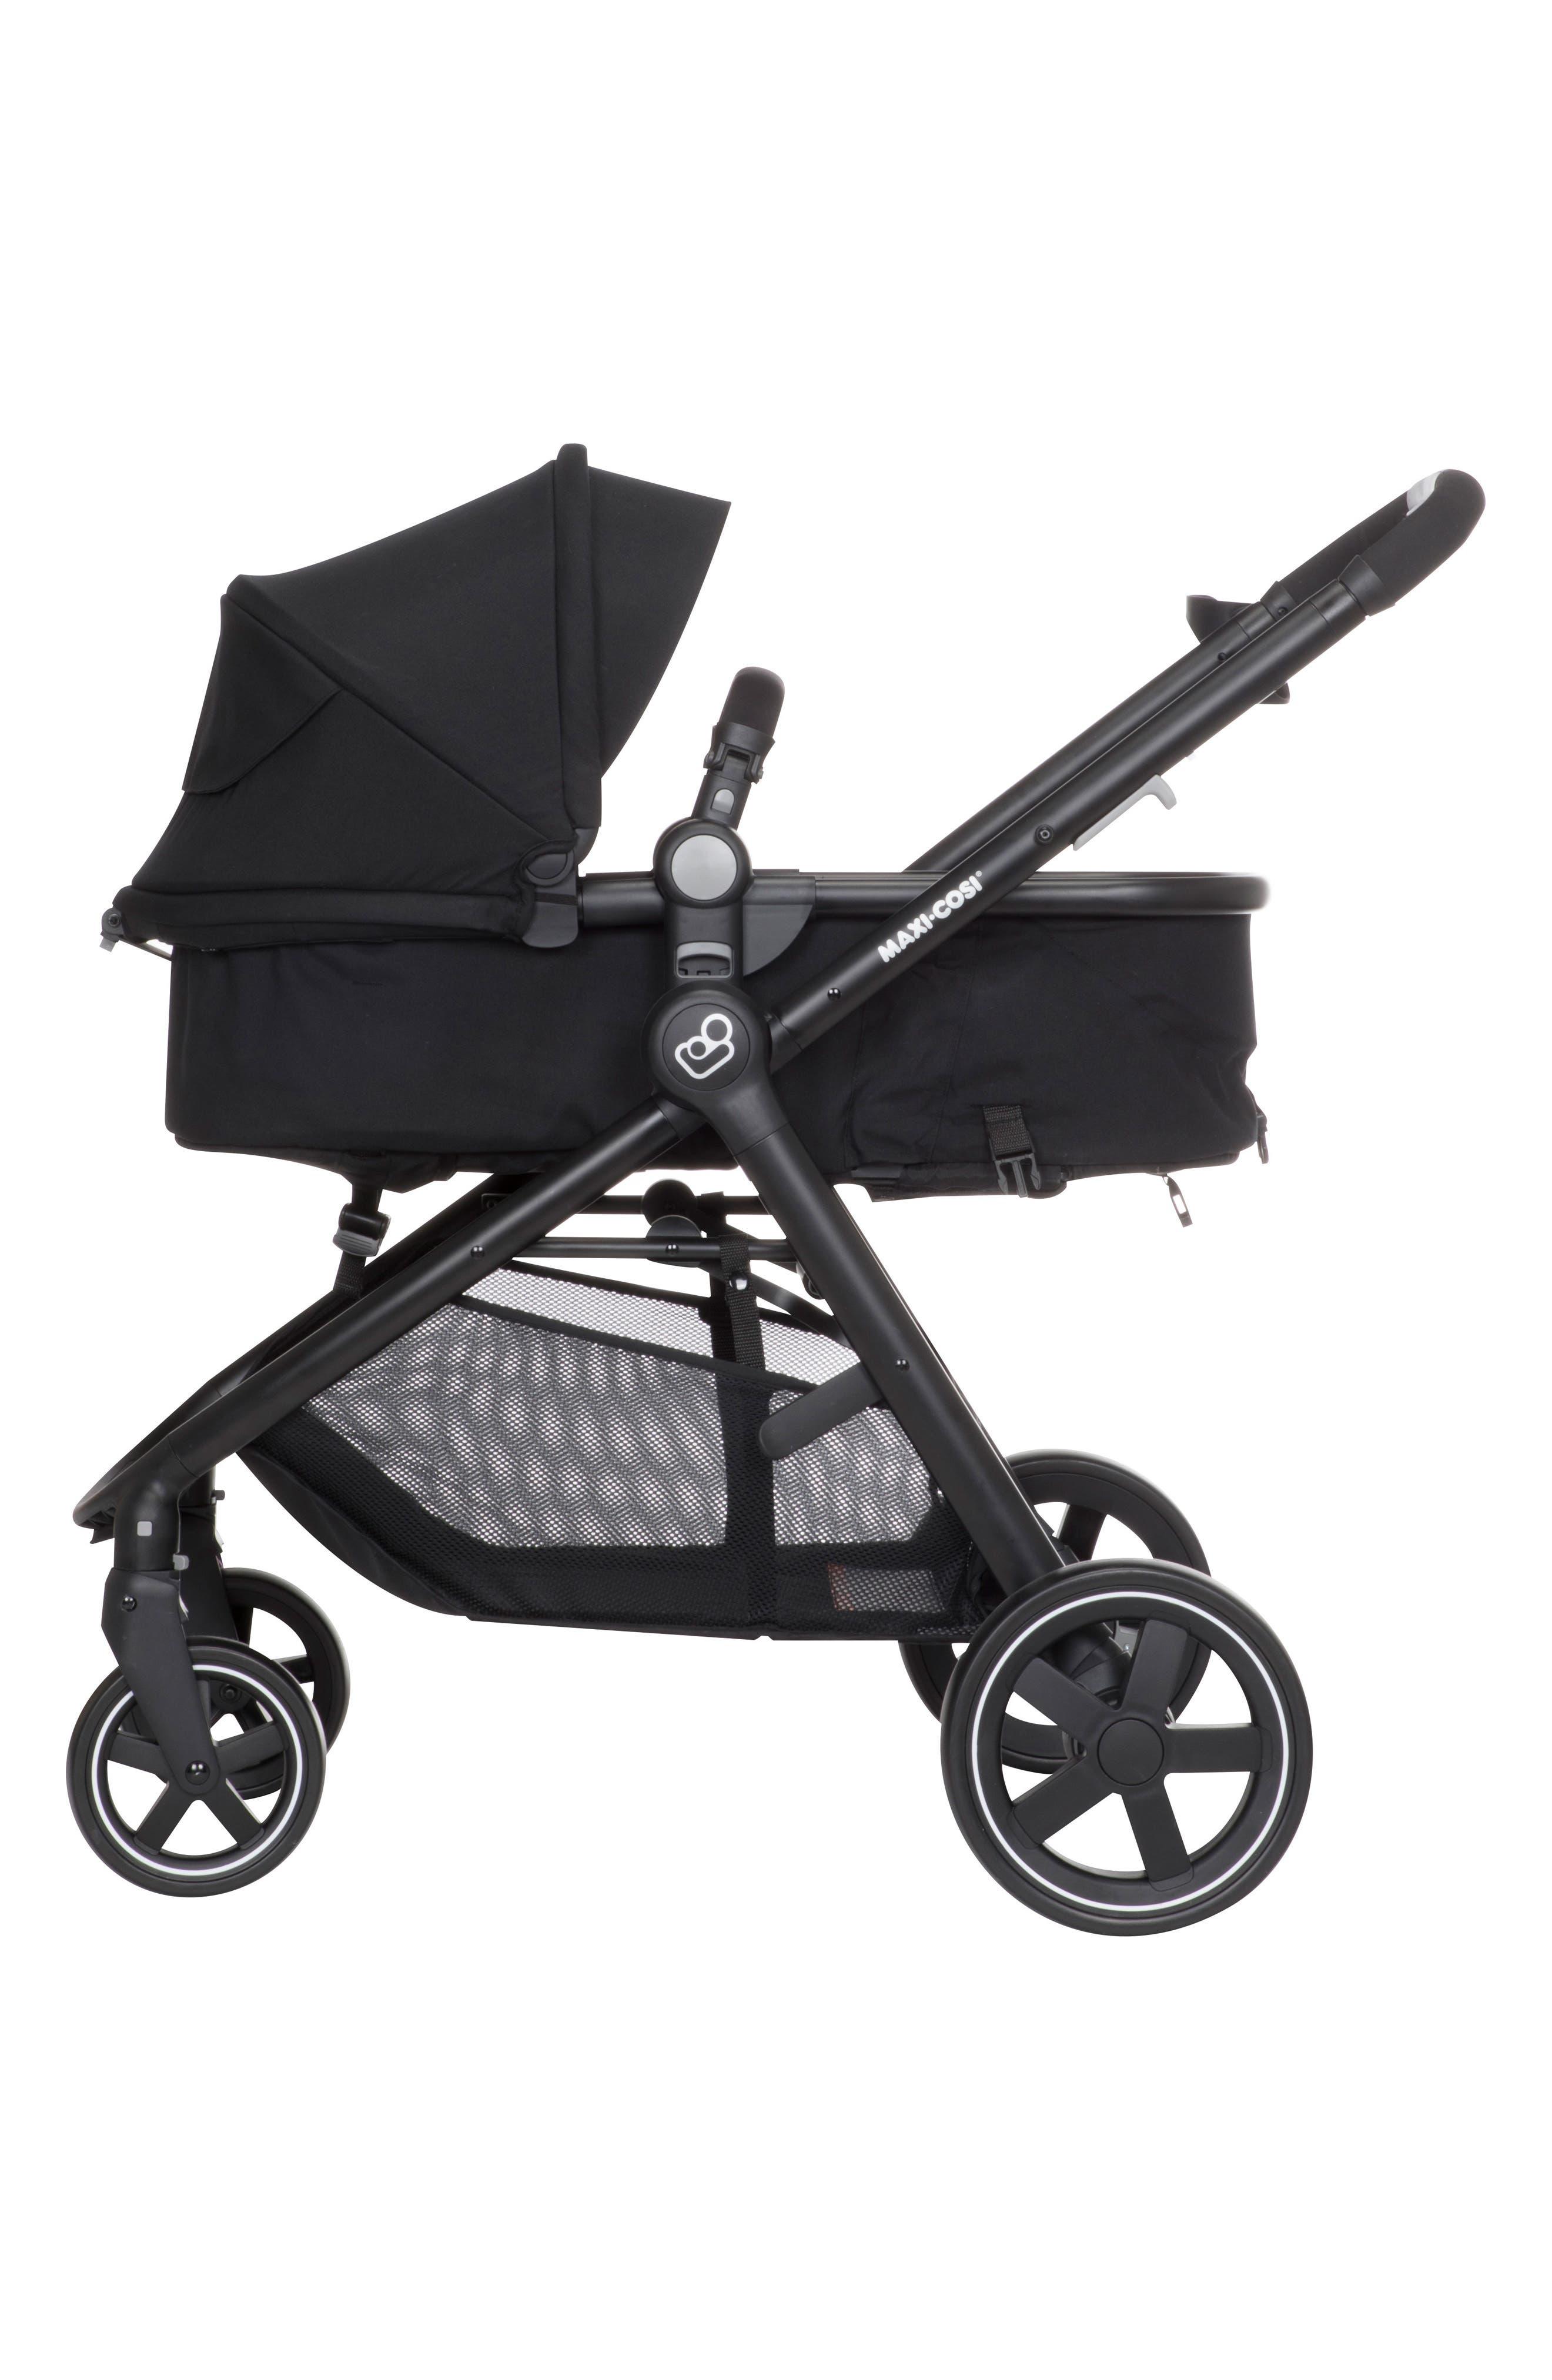 5-1 Mico 30 Infant Car Seat & Zelia Stroller Modular Travel System,                             Alternate thumbnail 7, color,                             NIGHT BLACK